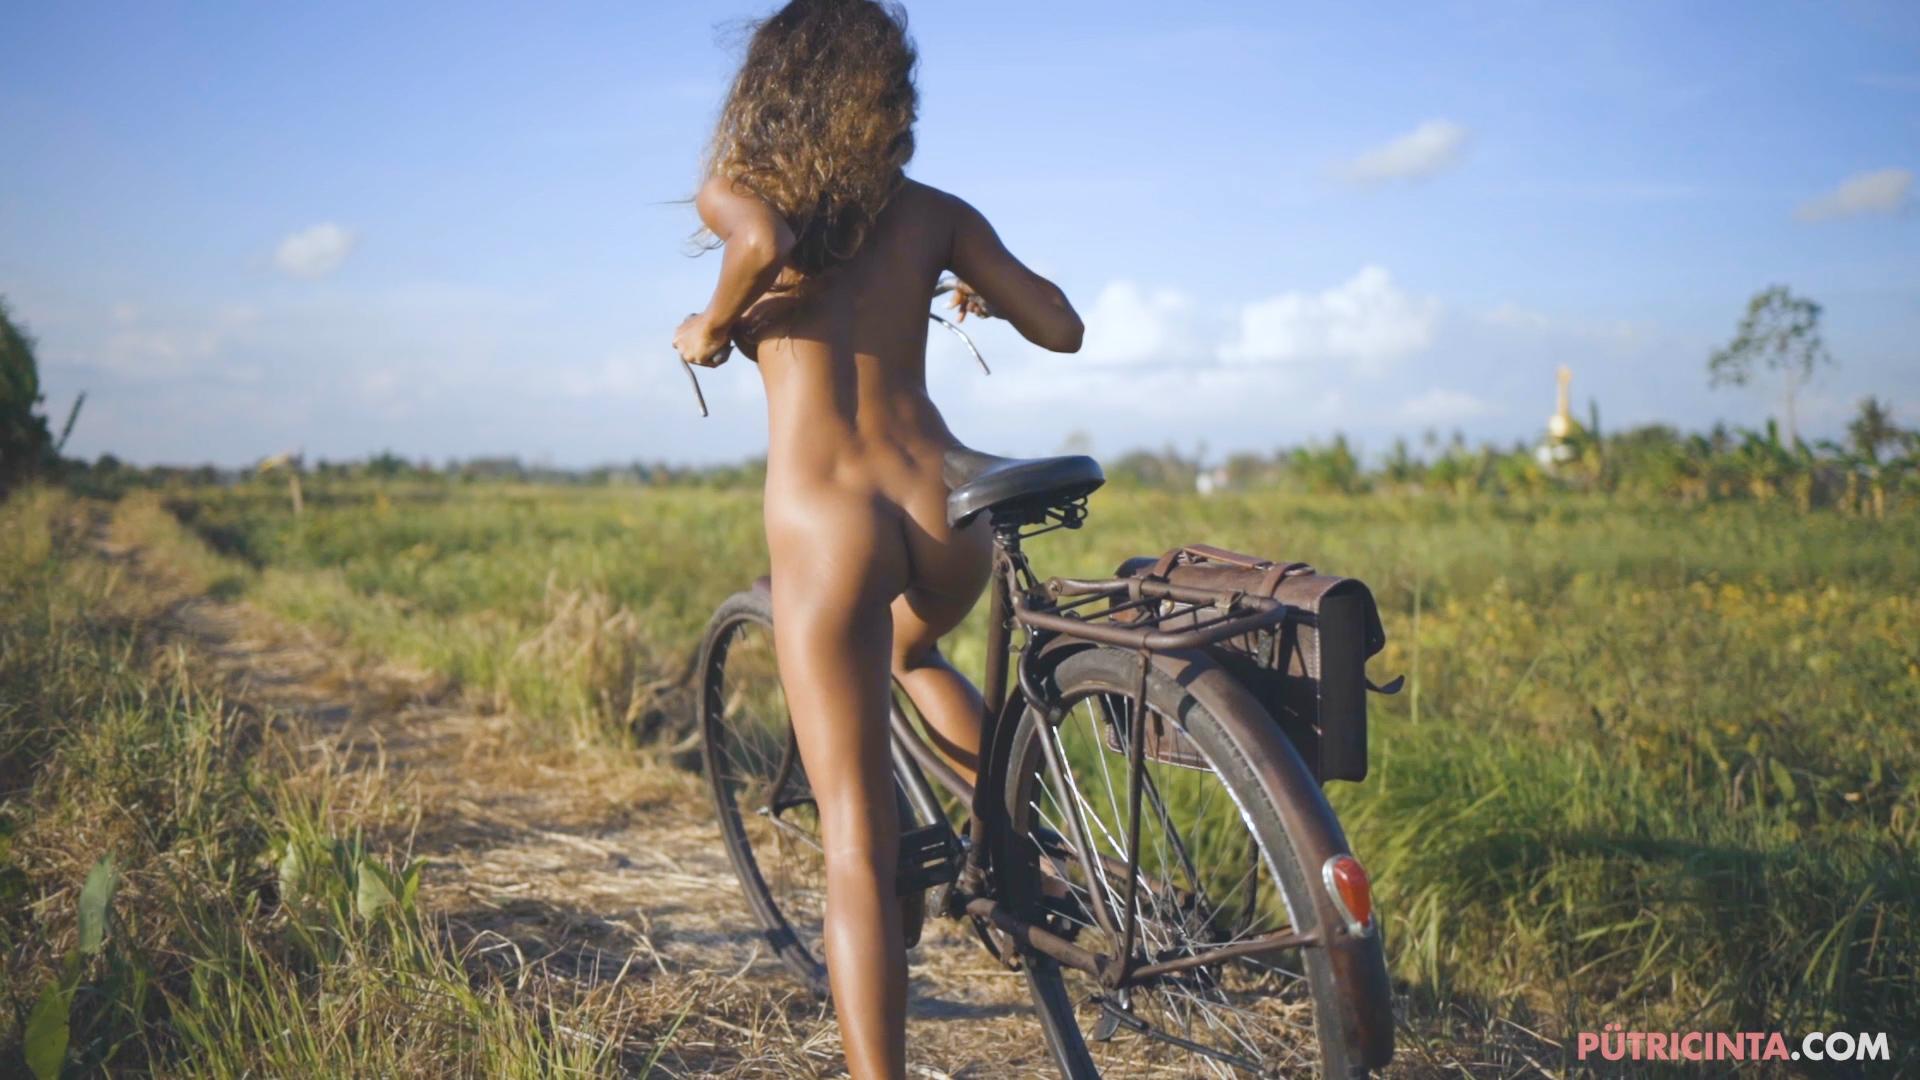 024-cyclingcommando-Putri-Cinta-teaser-stills-20.jpg